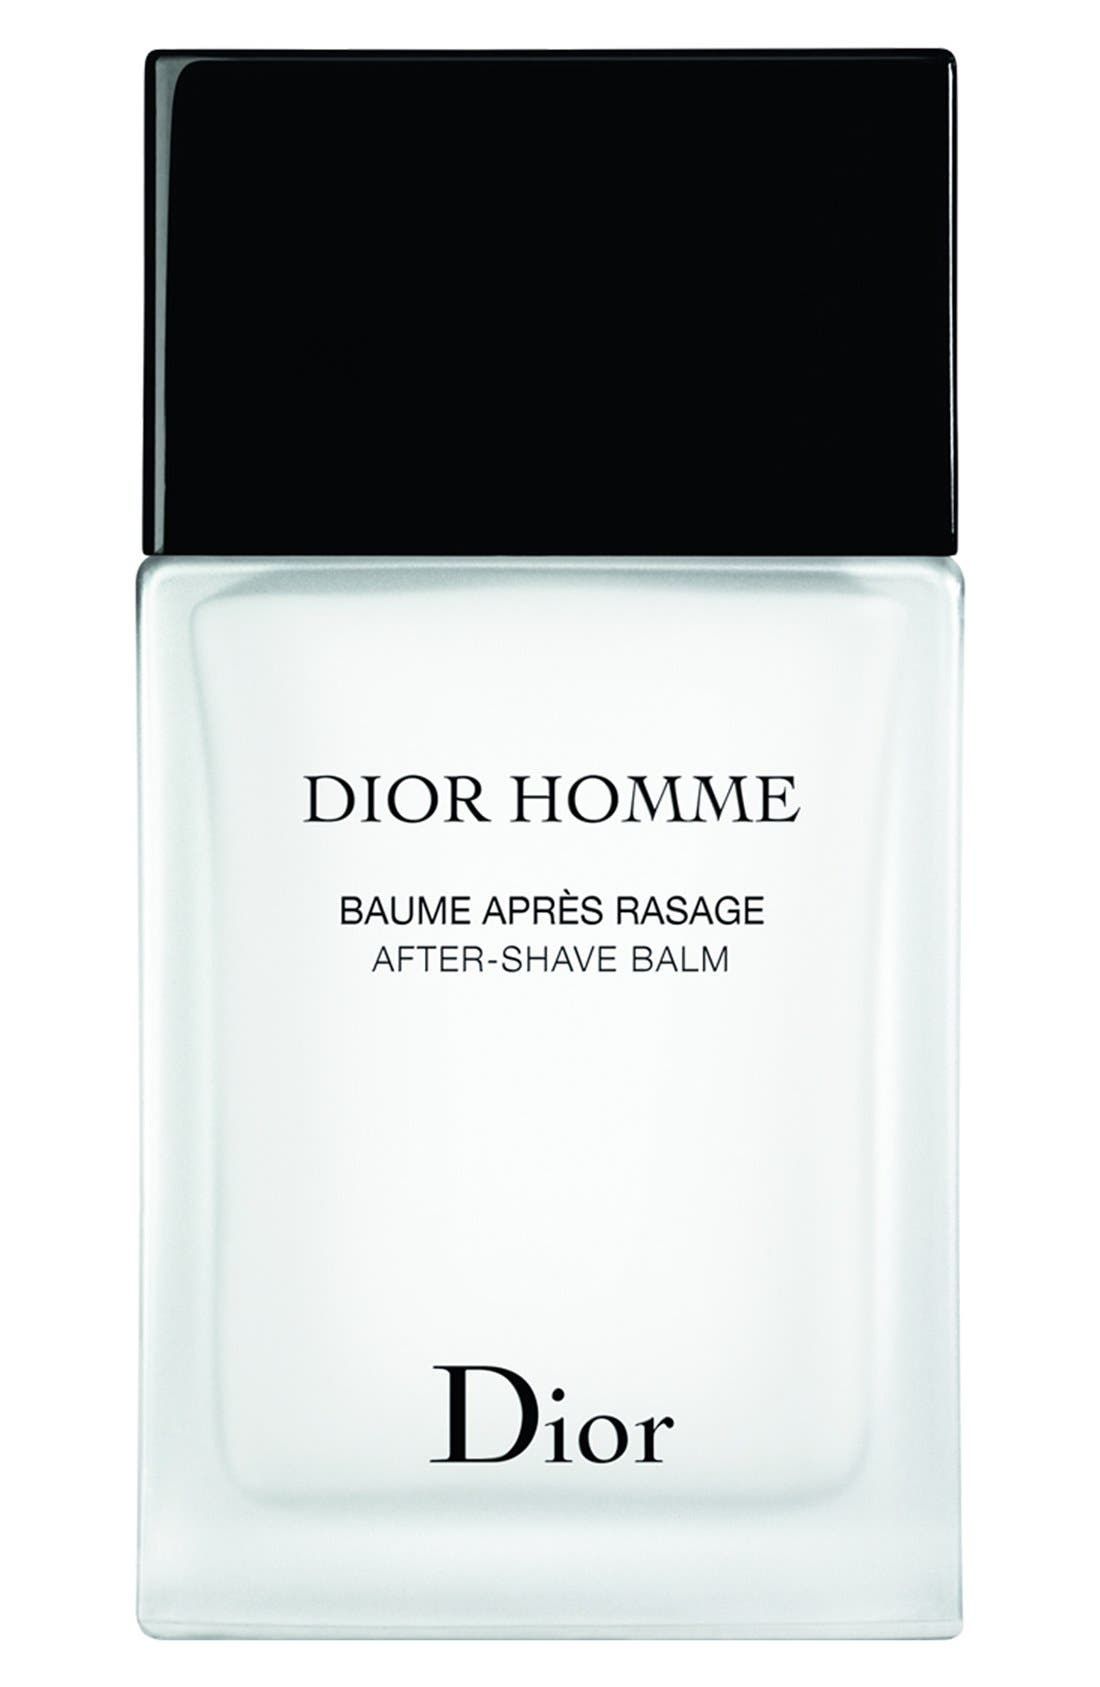 Dior Homme After-Shave Balm